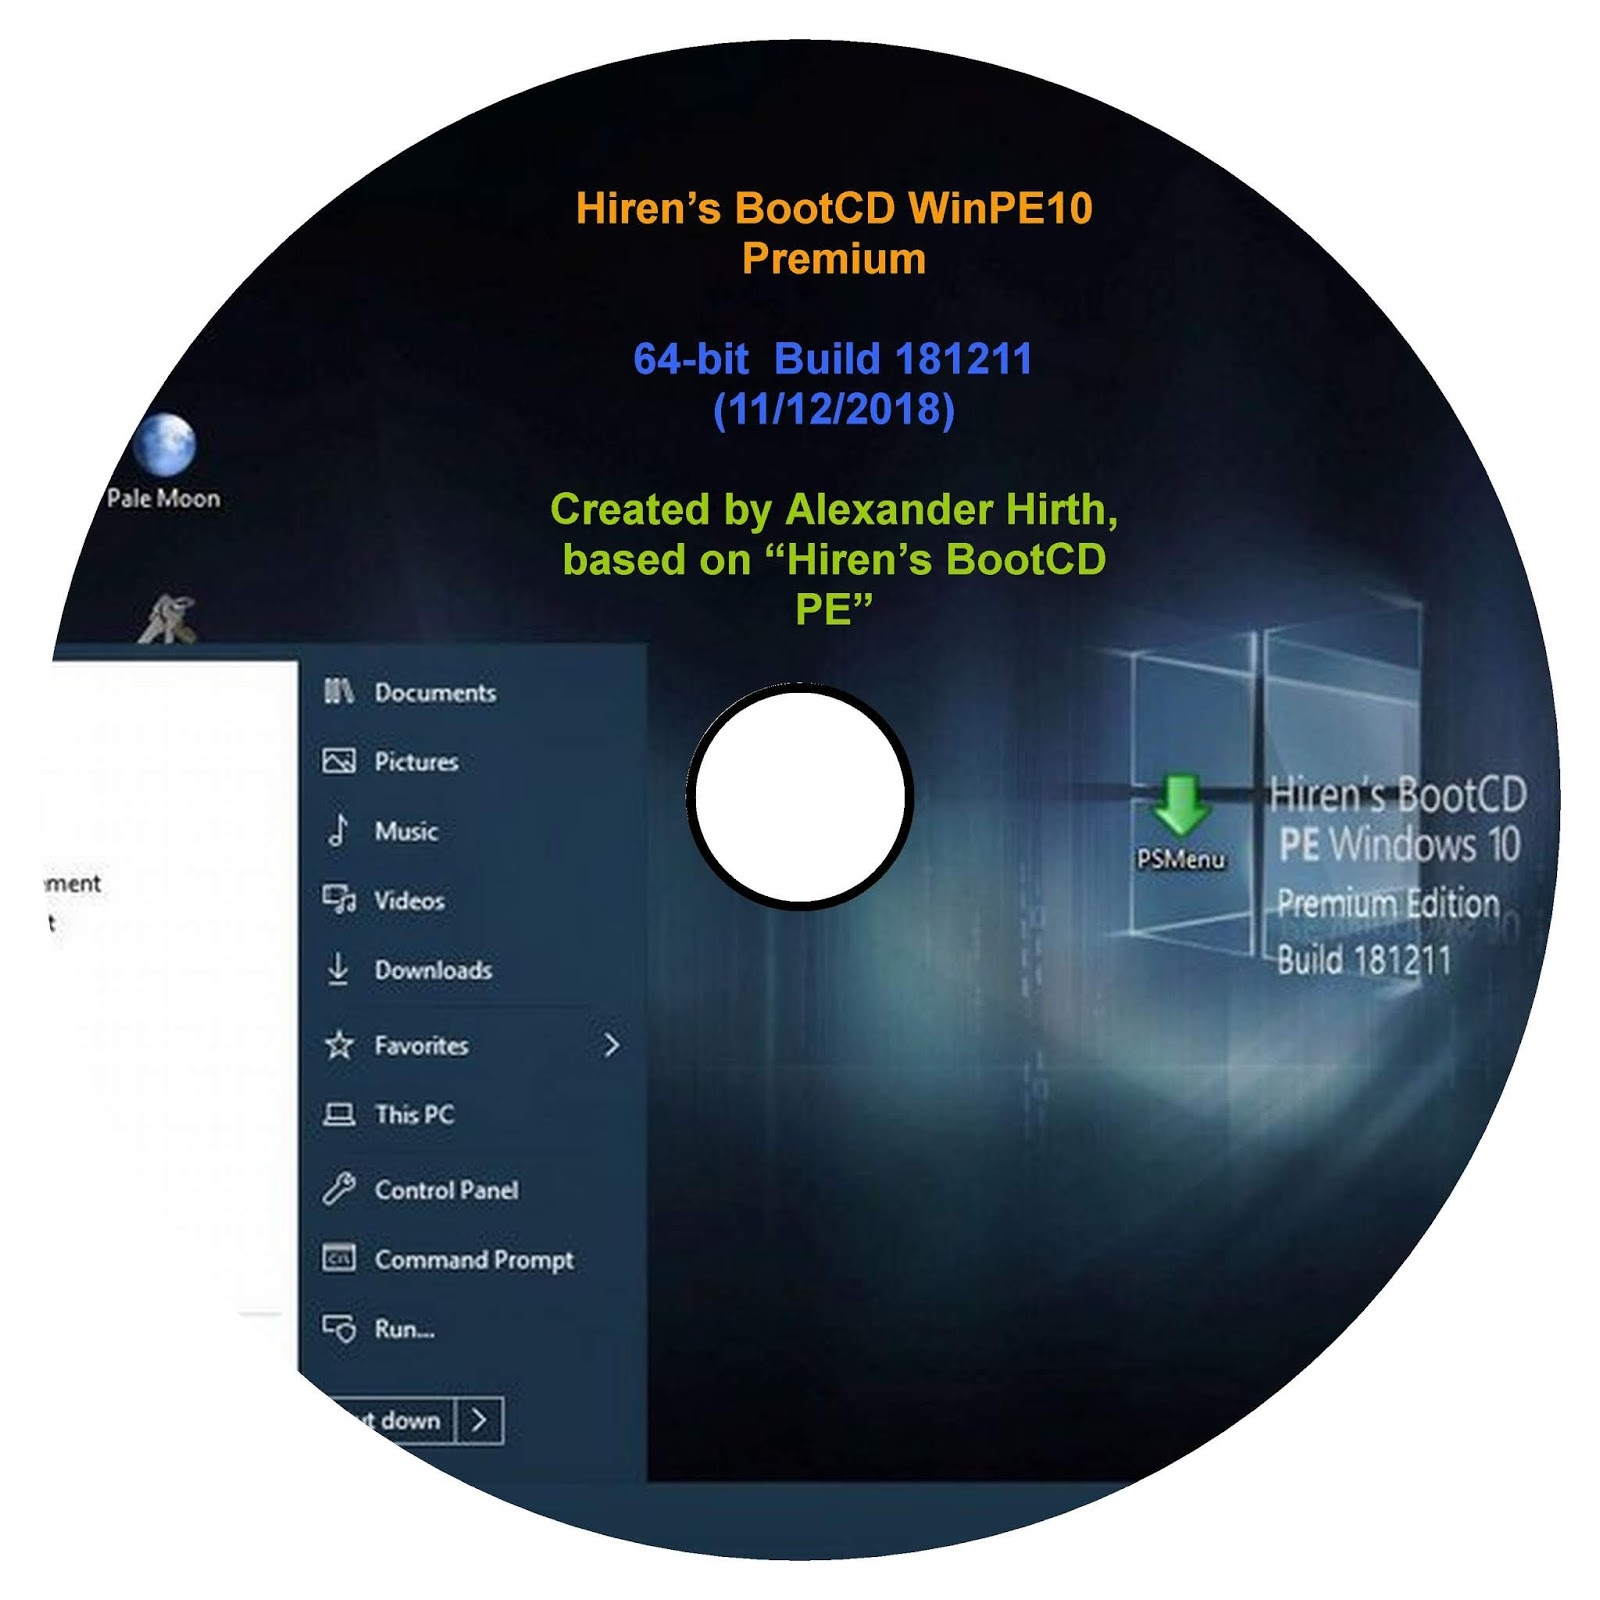 Hiren's BootCD WinPE10 Premium Edition 64-bit Build 181211